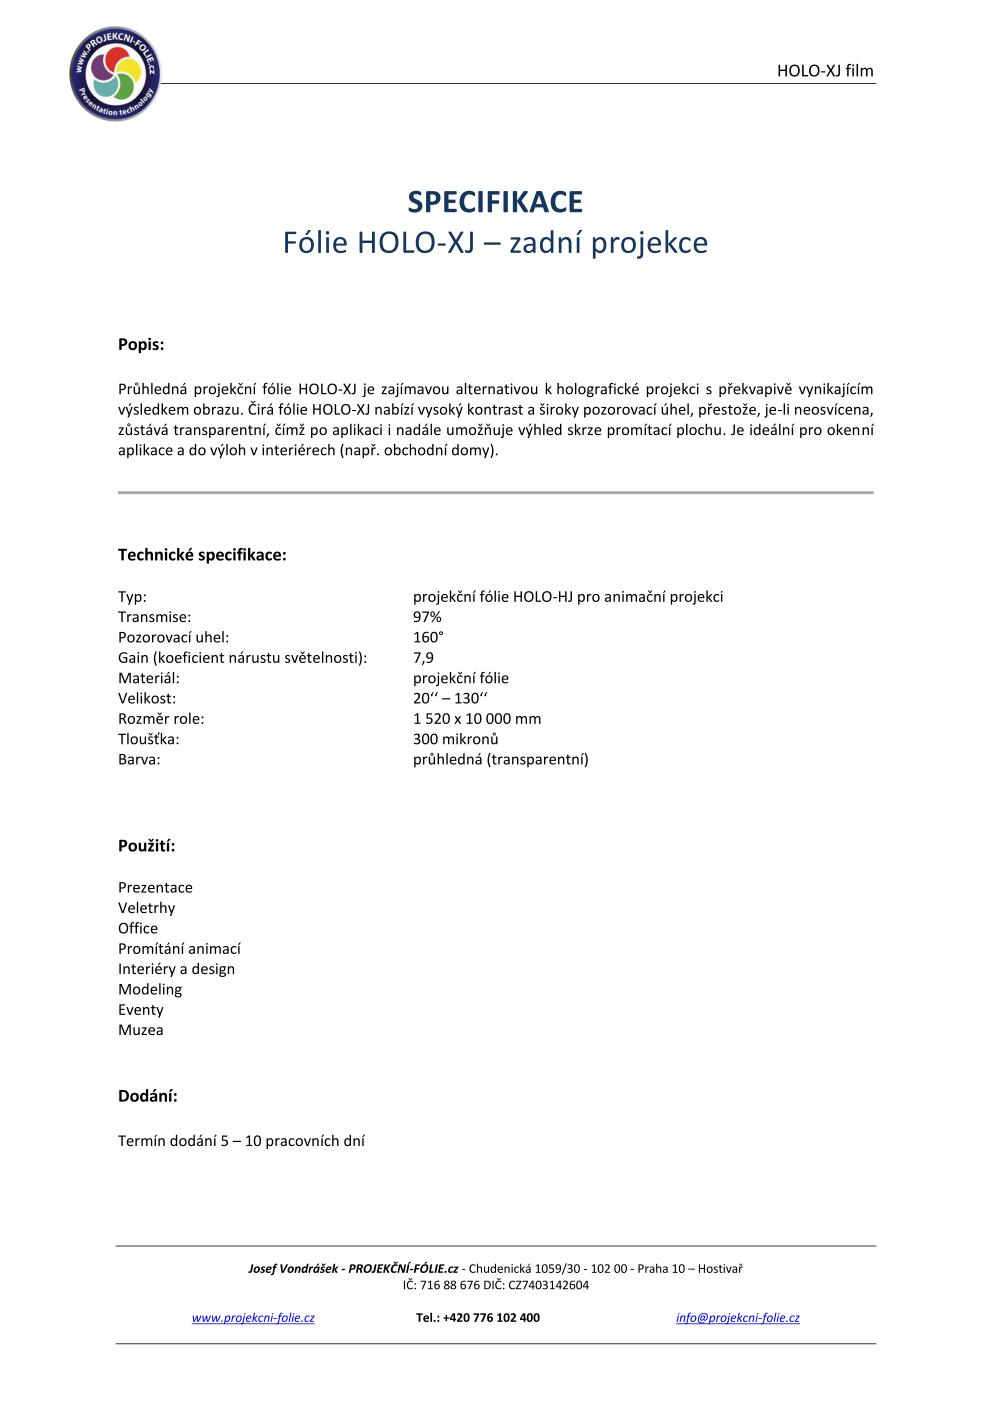 Specifikace HOLO-XJ Film